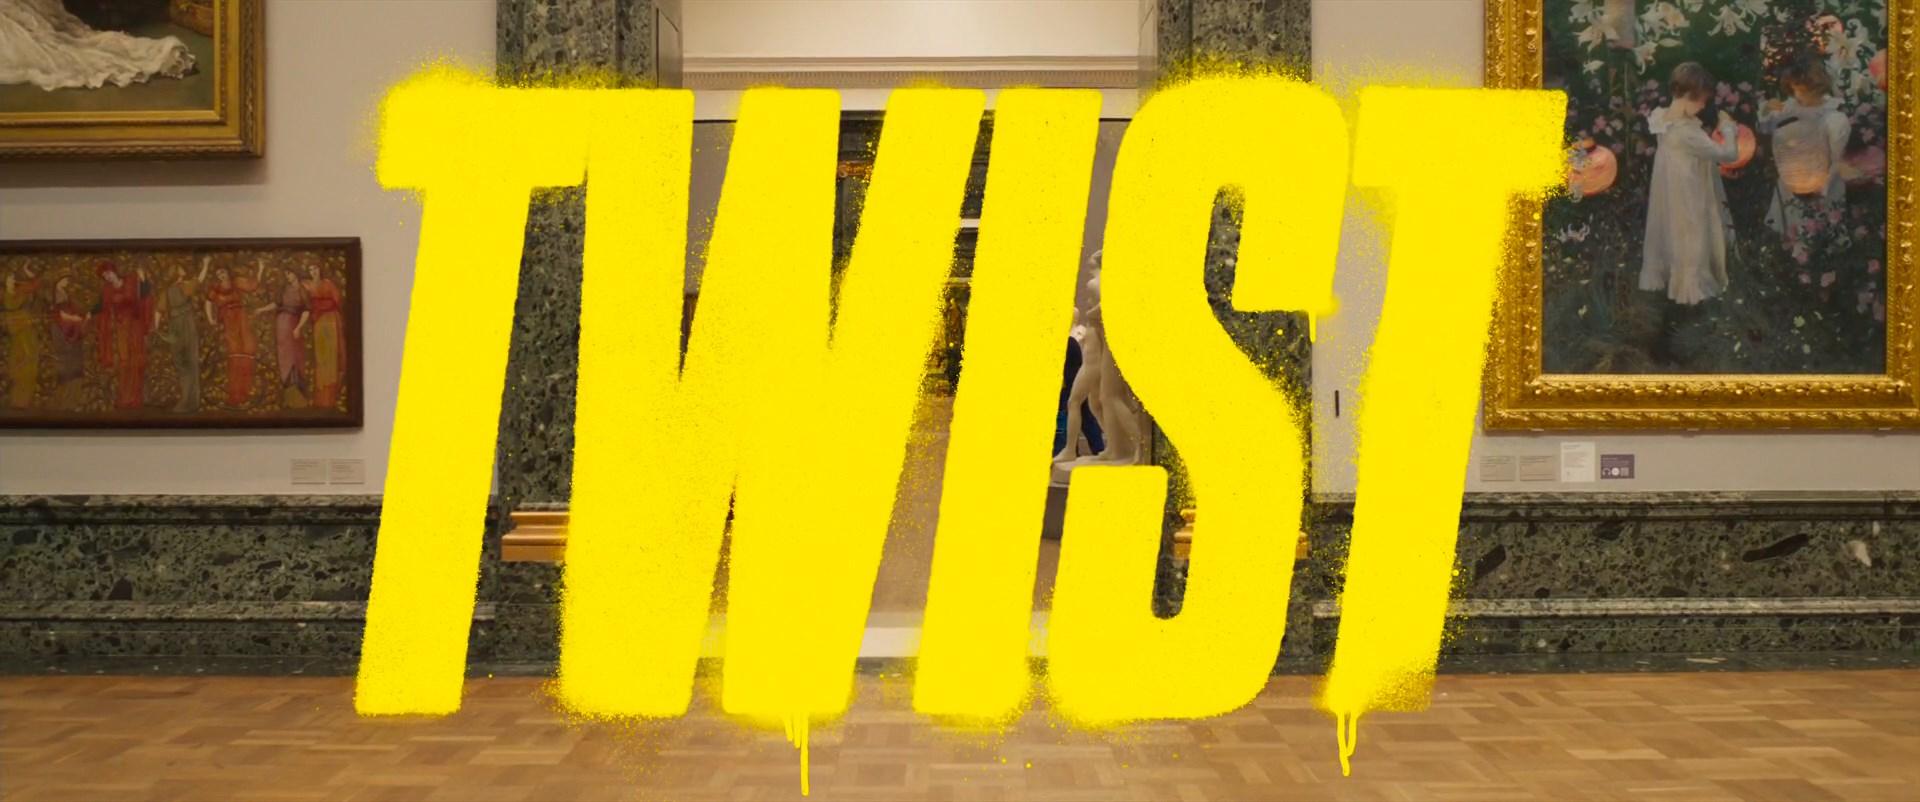 Twist (2021) 1080p WEB-DL Latino